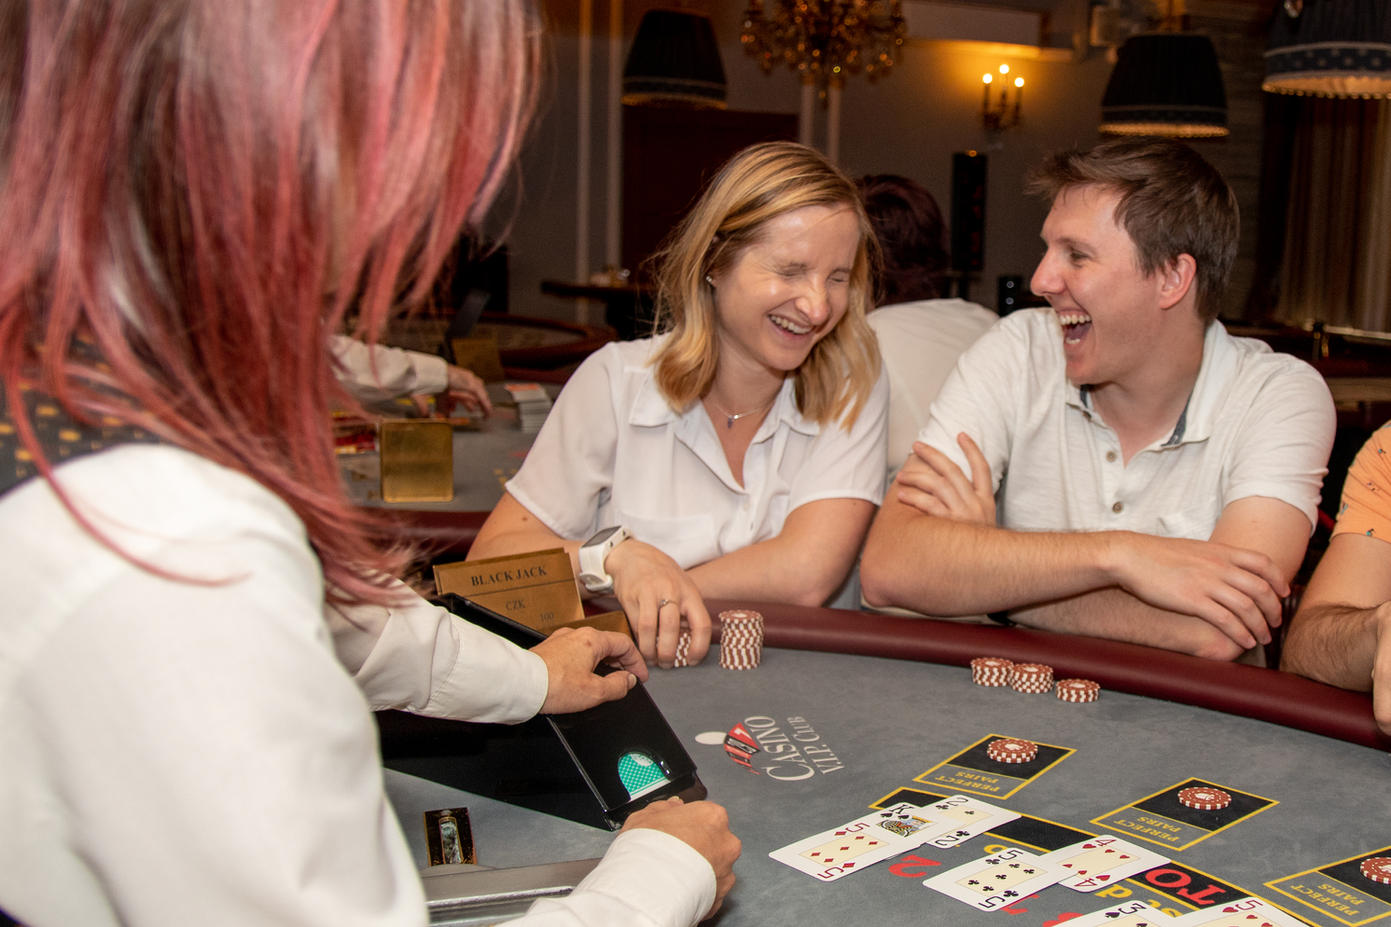 Ambassador Casino Happy Hour June 2020-2